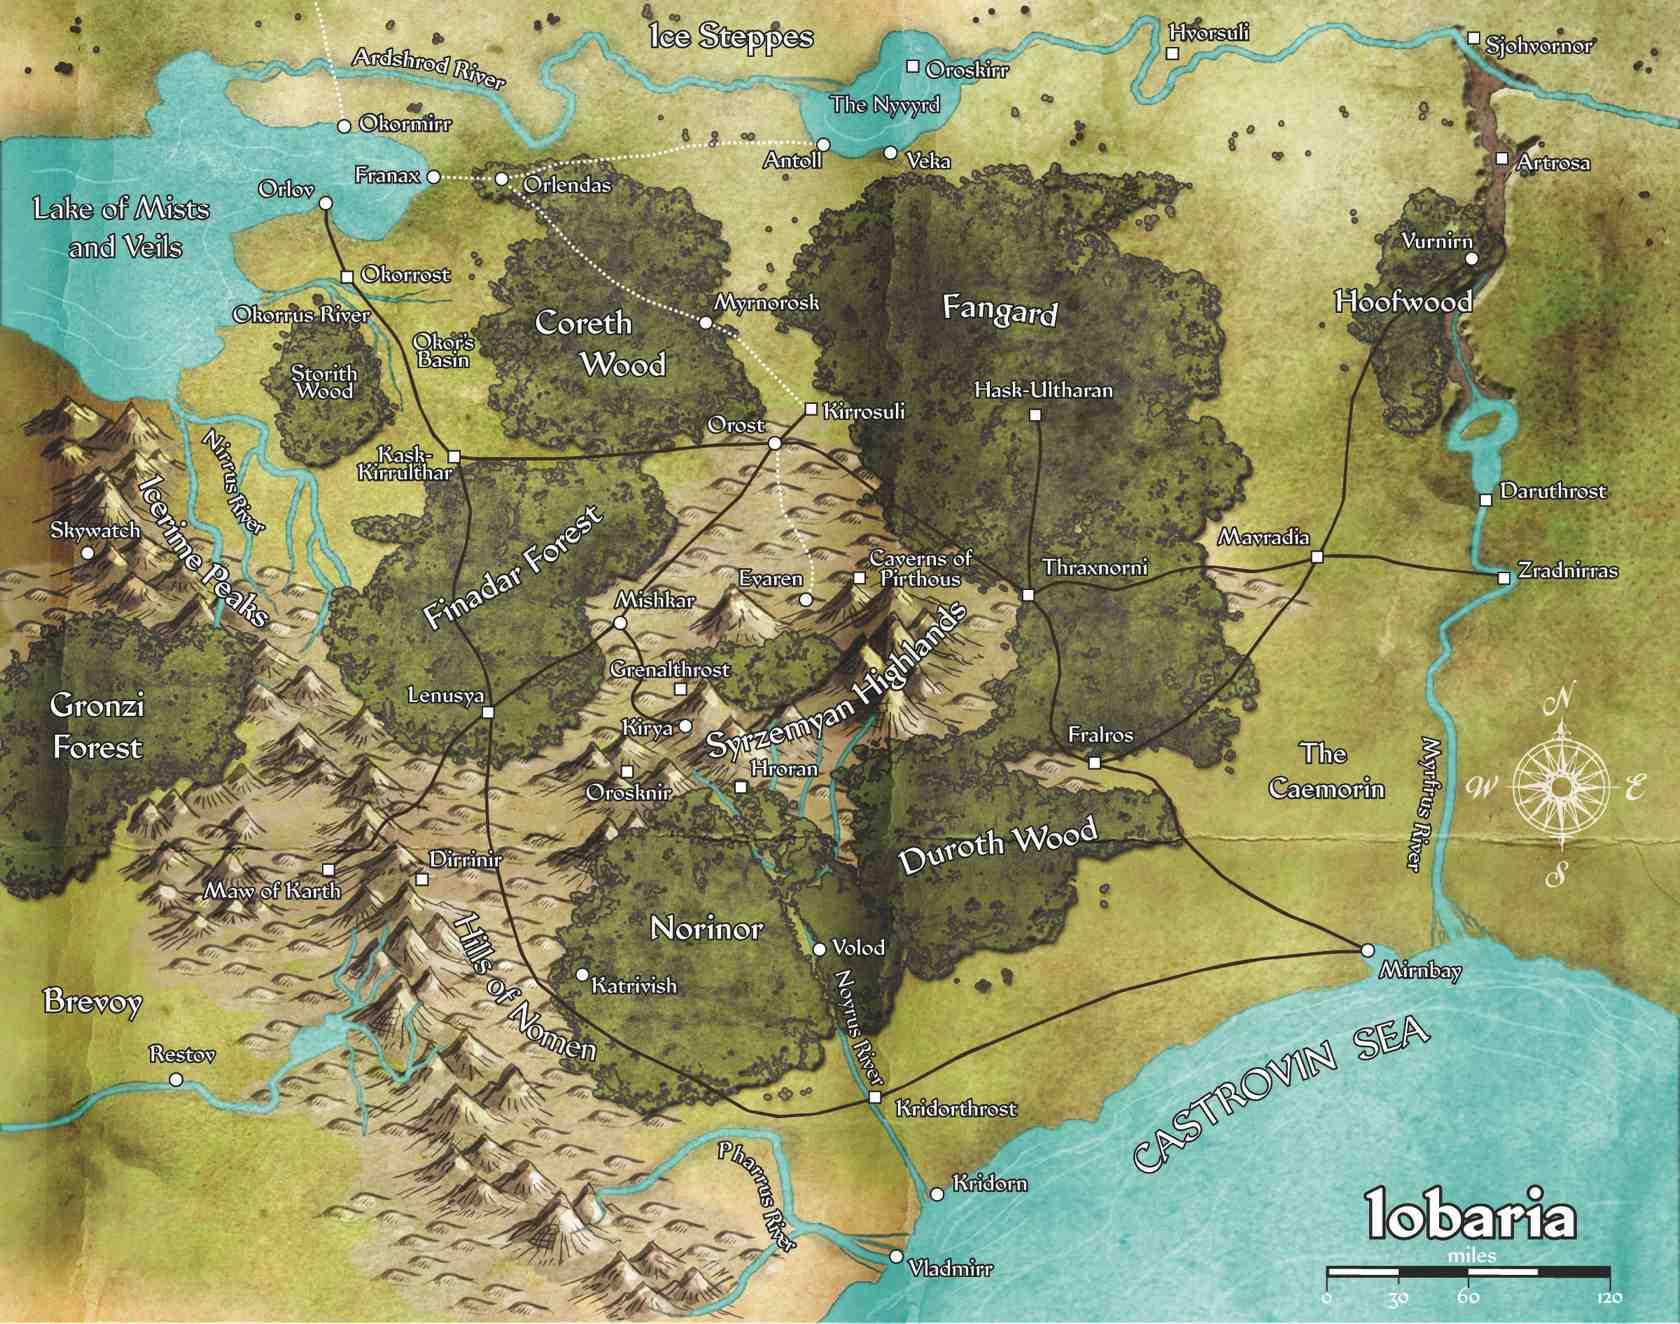 Iobaria_map.jpg